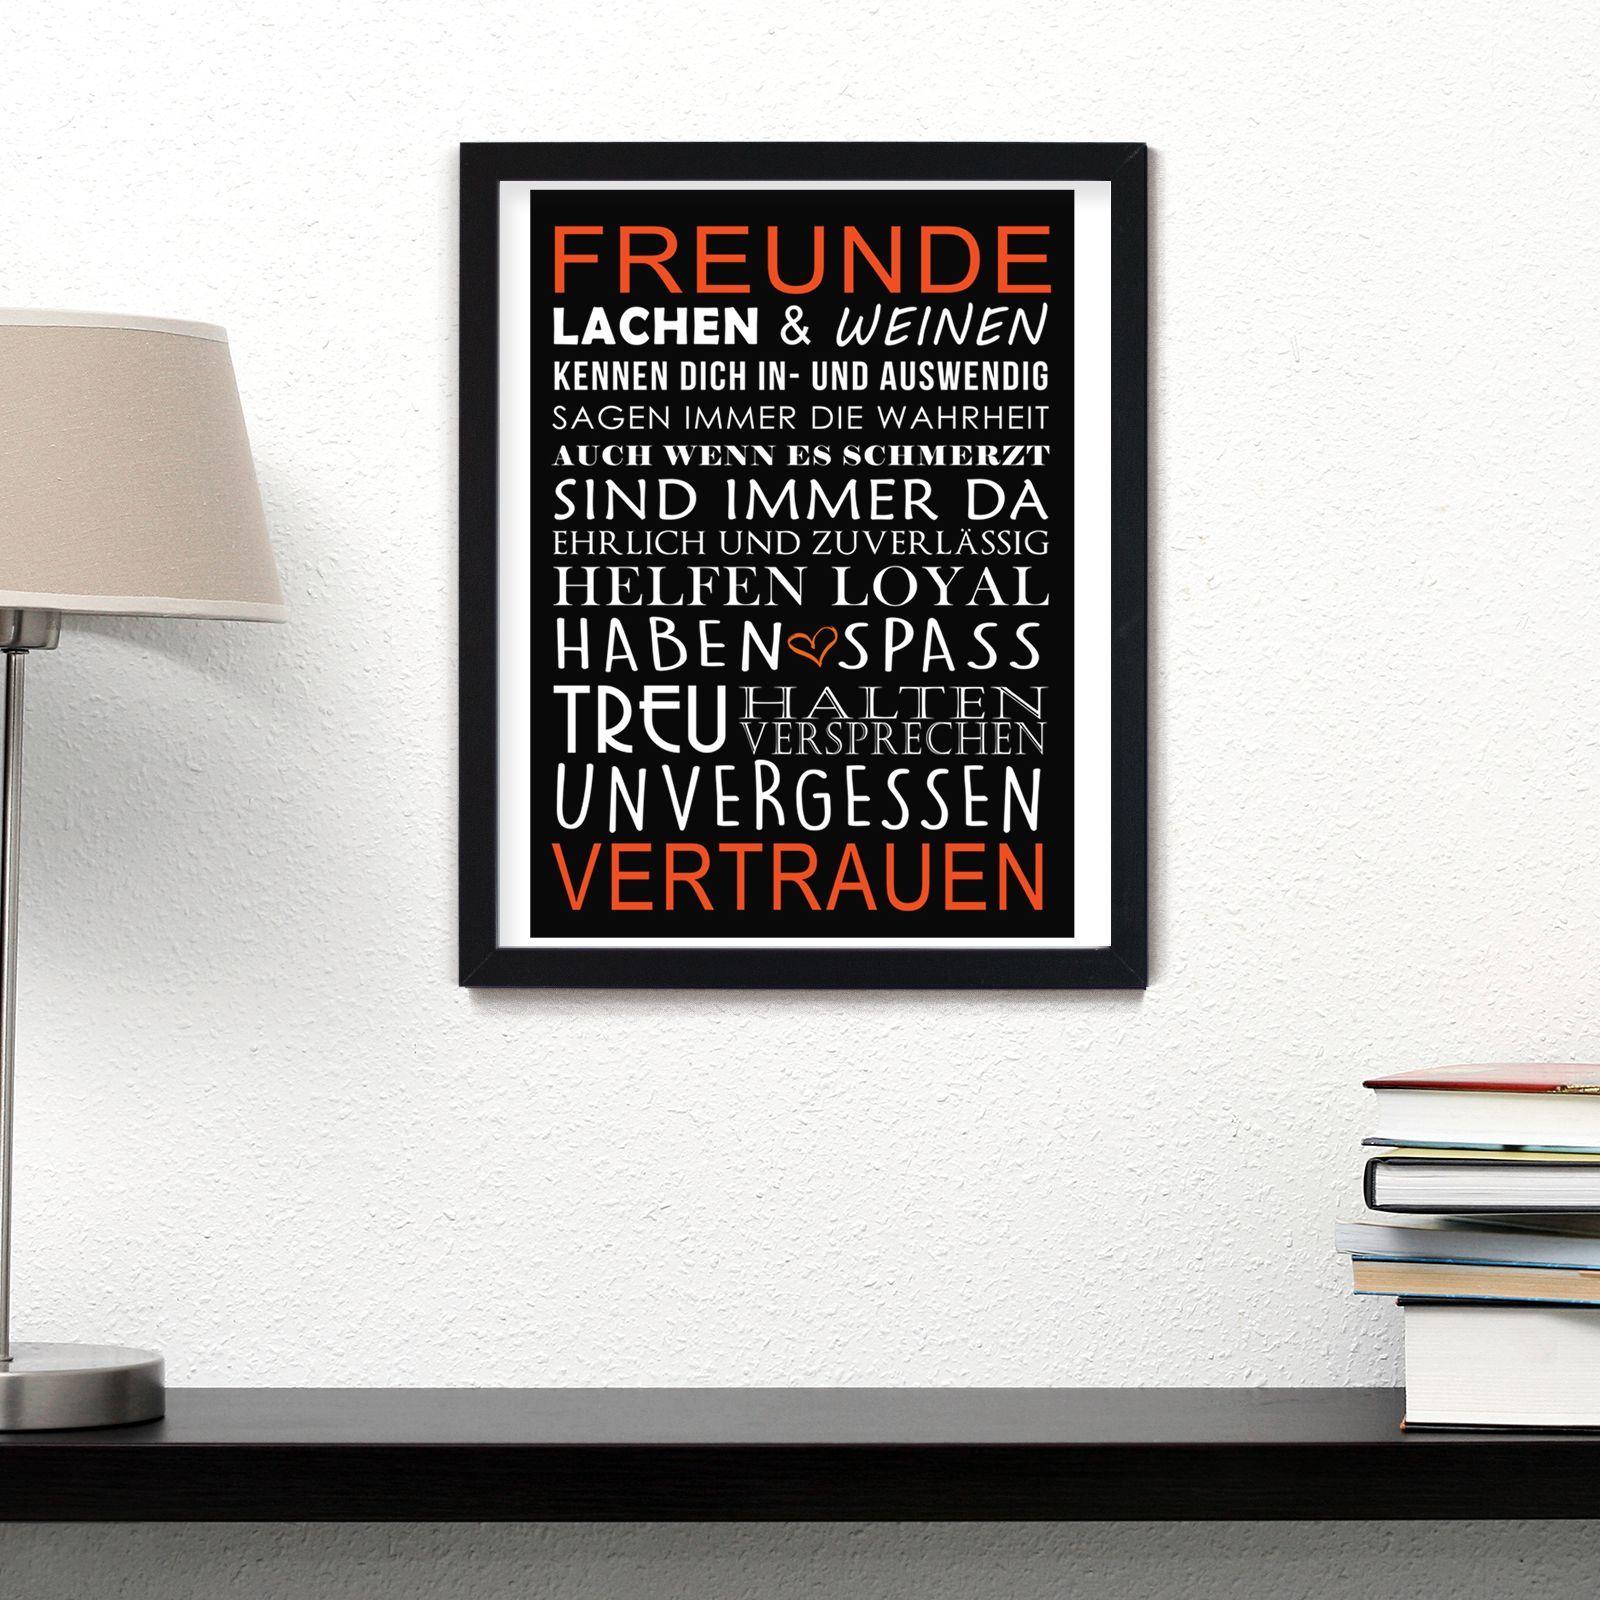 Großzügig Freunde Rahmen Zeitgenössisch - Bilderrahmen Ideen ...